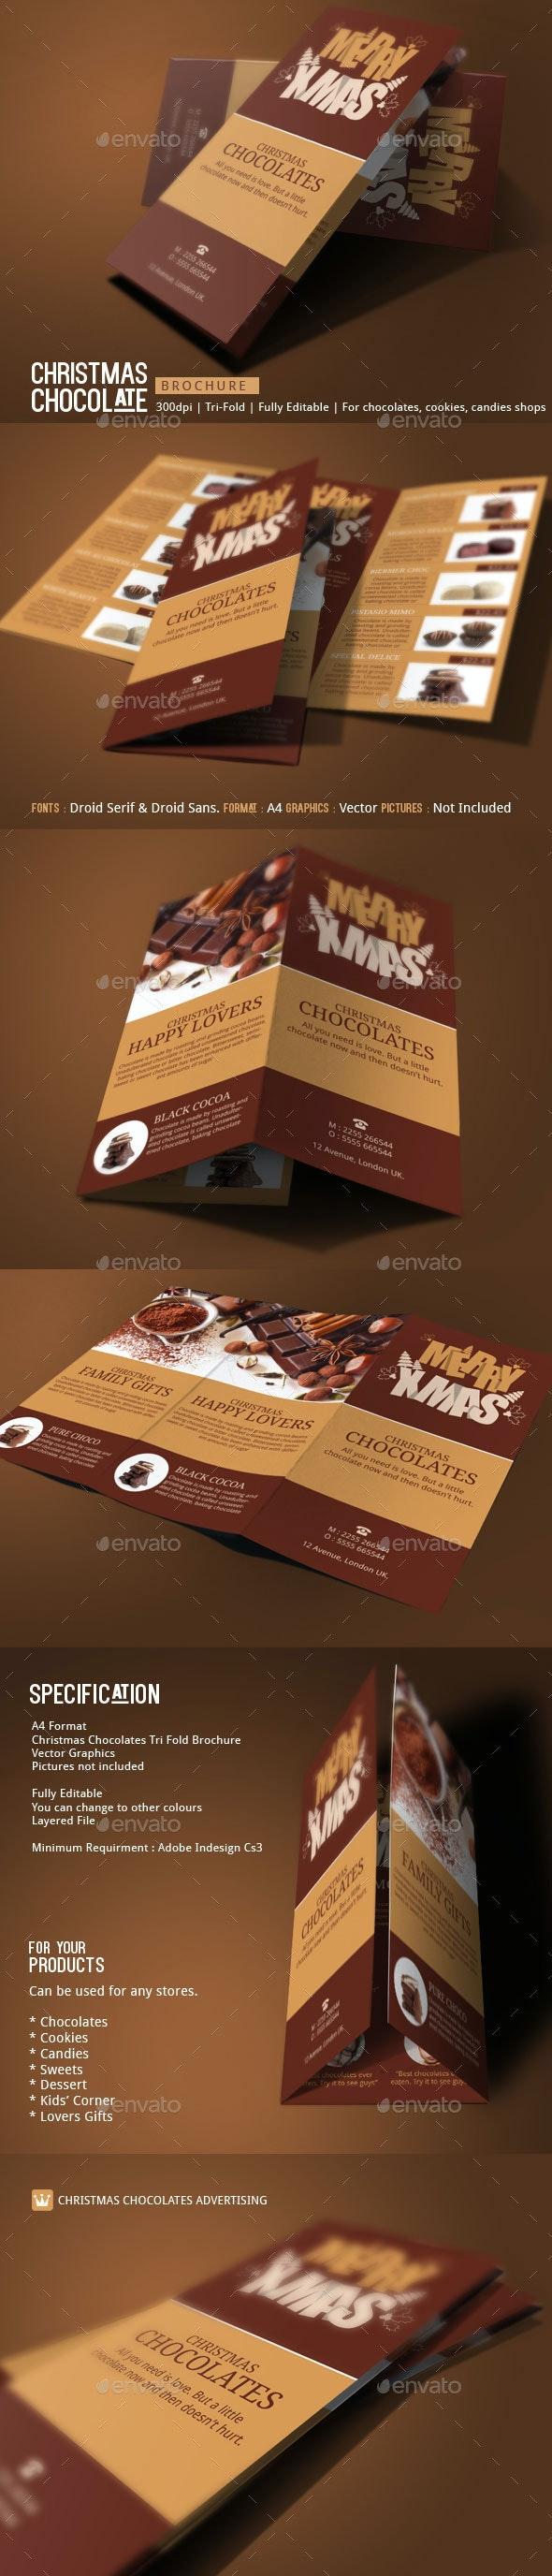 Christmas Chocolates Brochure Template - Catalogs Brochures